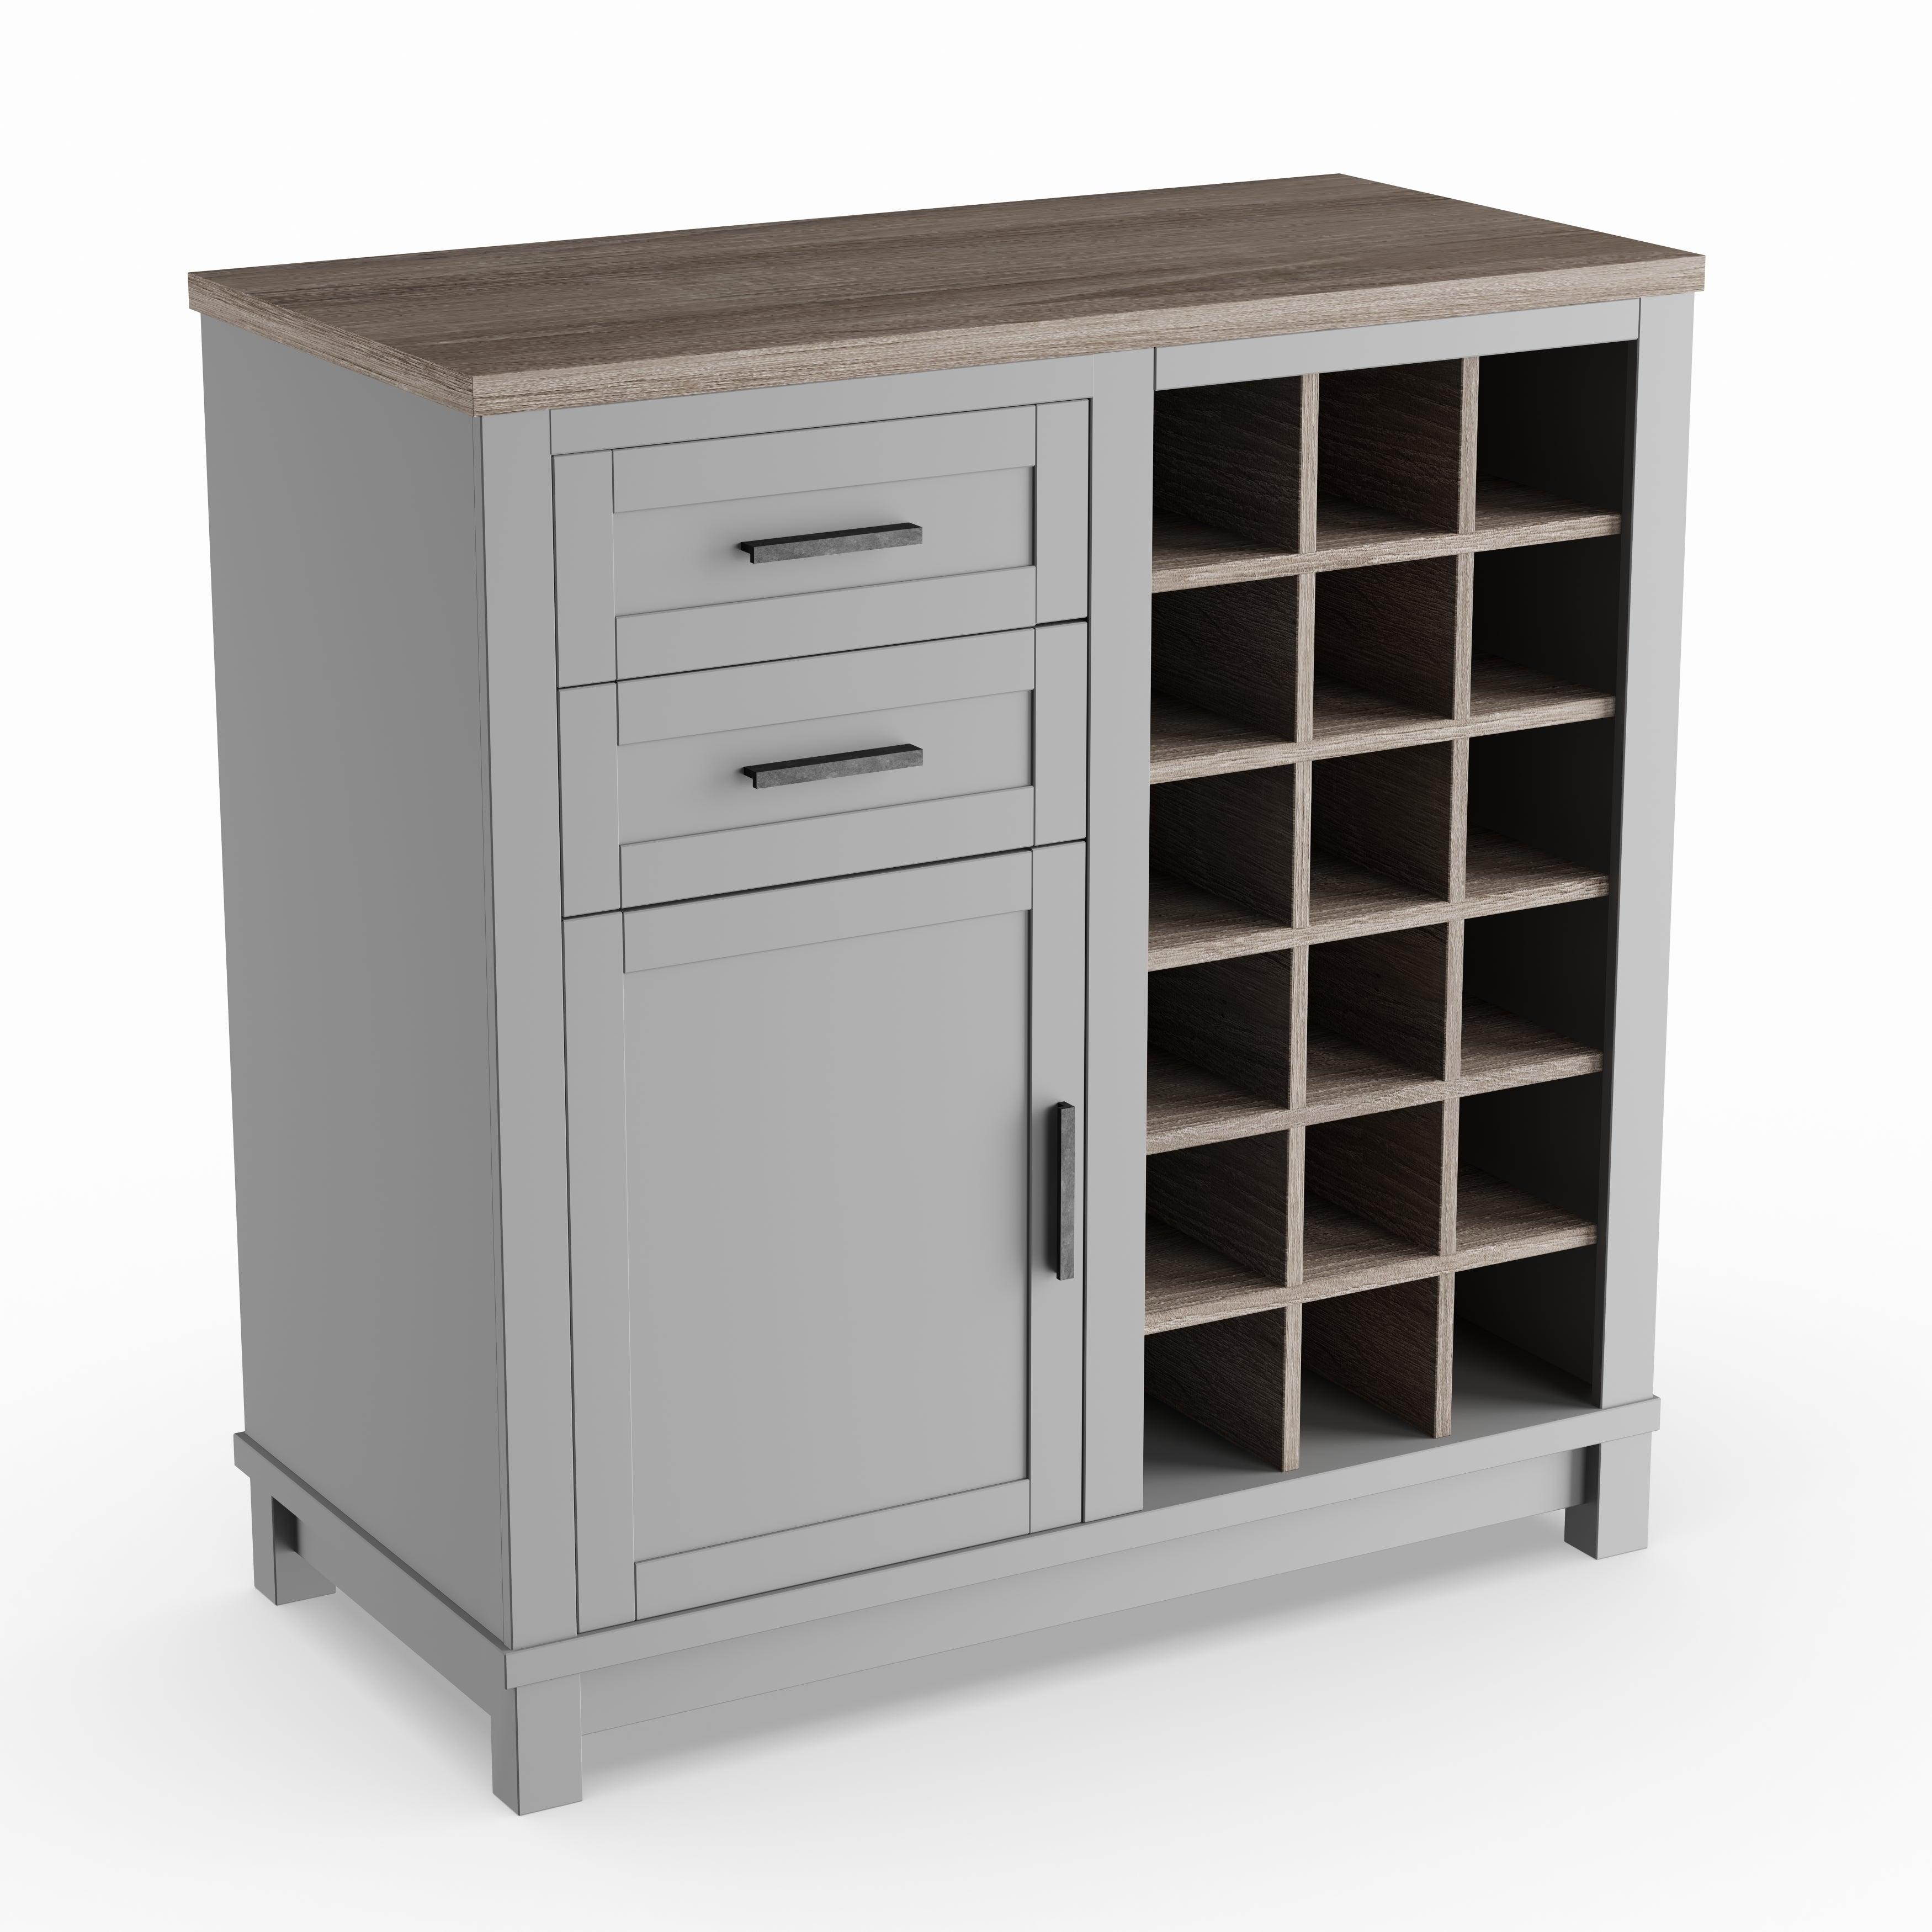 The Gray Barn Bonnie Wood Carver Grey Sonoma Oak Bar Cabinet within sizing 3500 X 3500